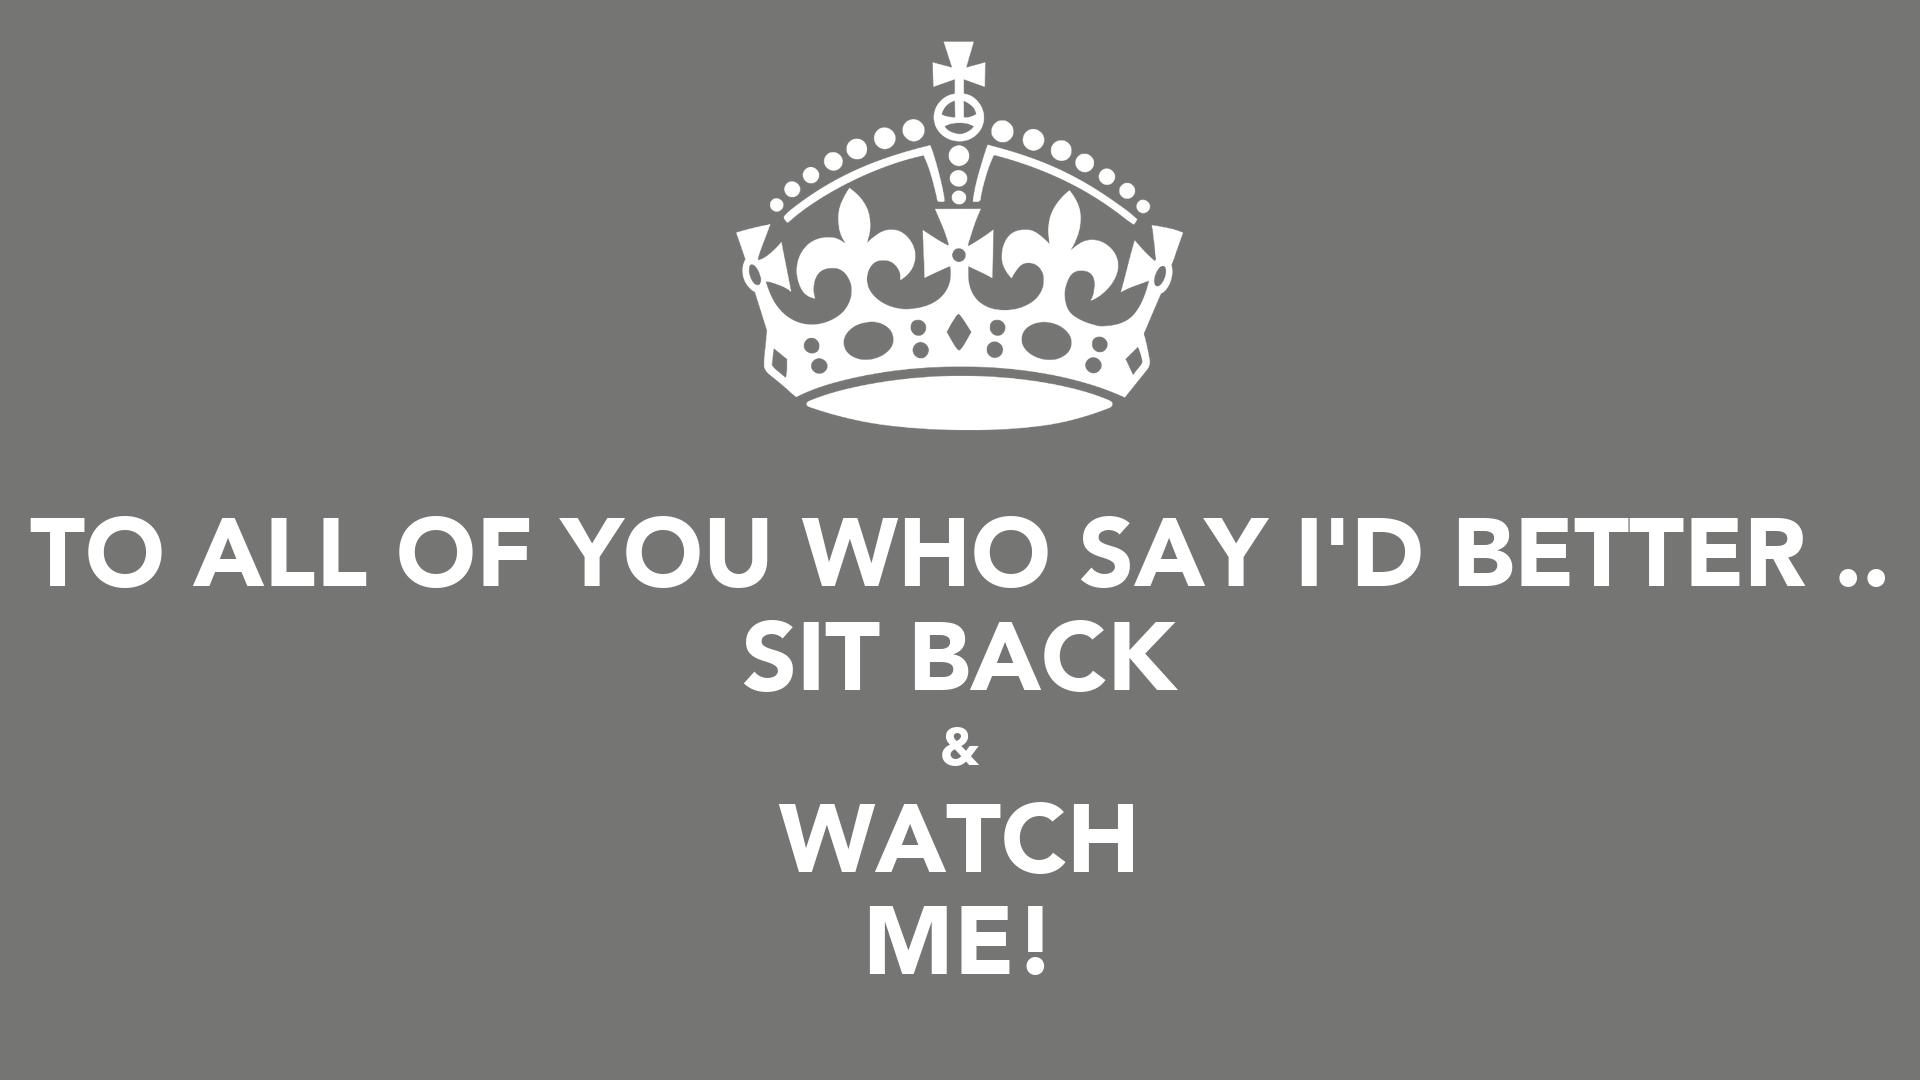 Watch Back Sit Back Watch me